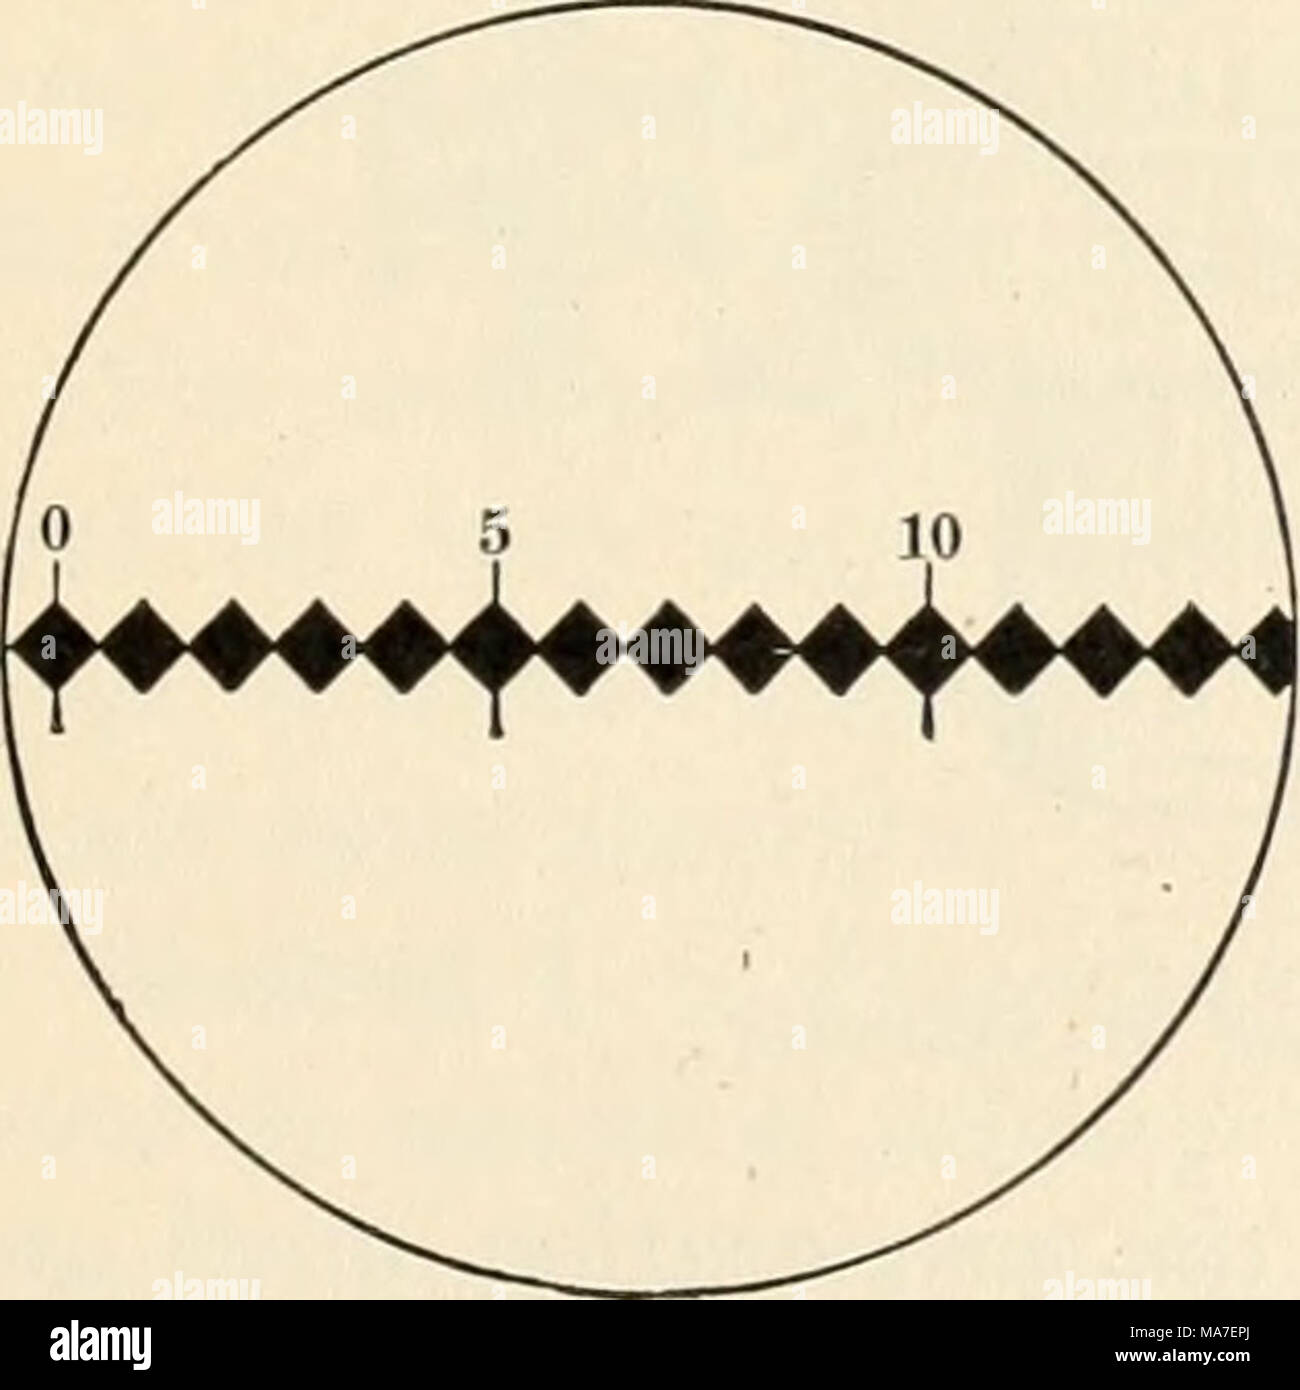 . Elementary chemical microscopy . - Stock Image